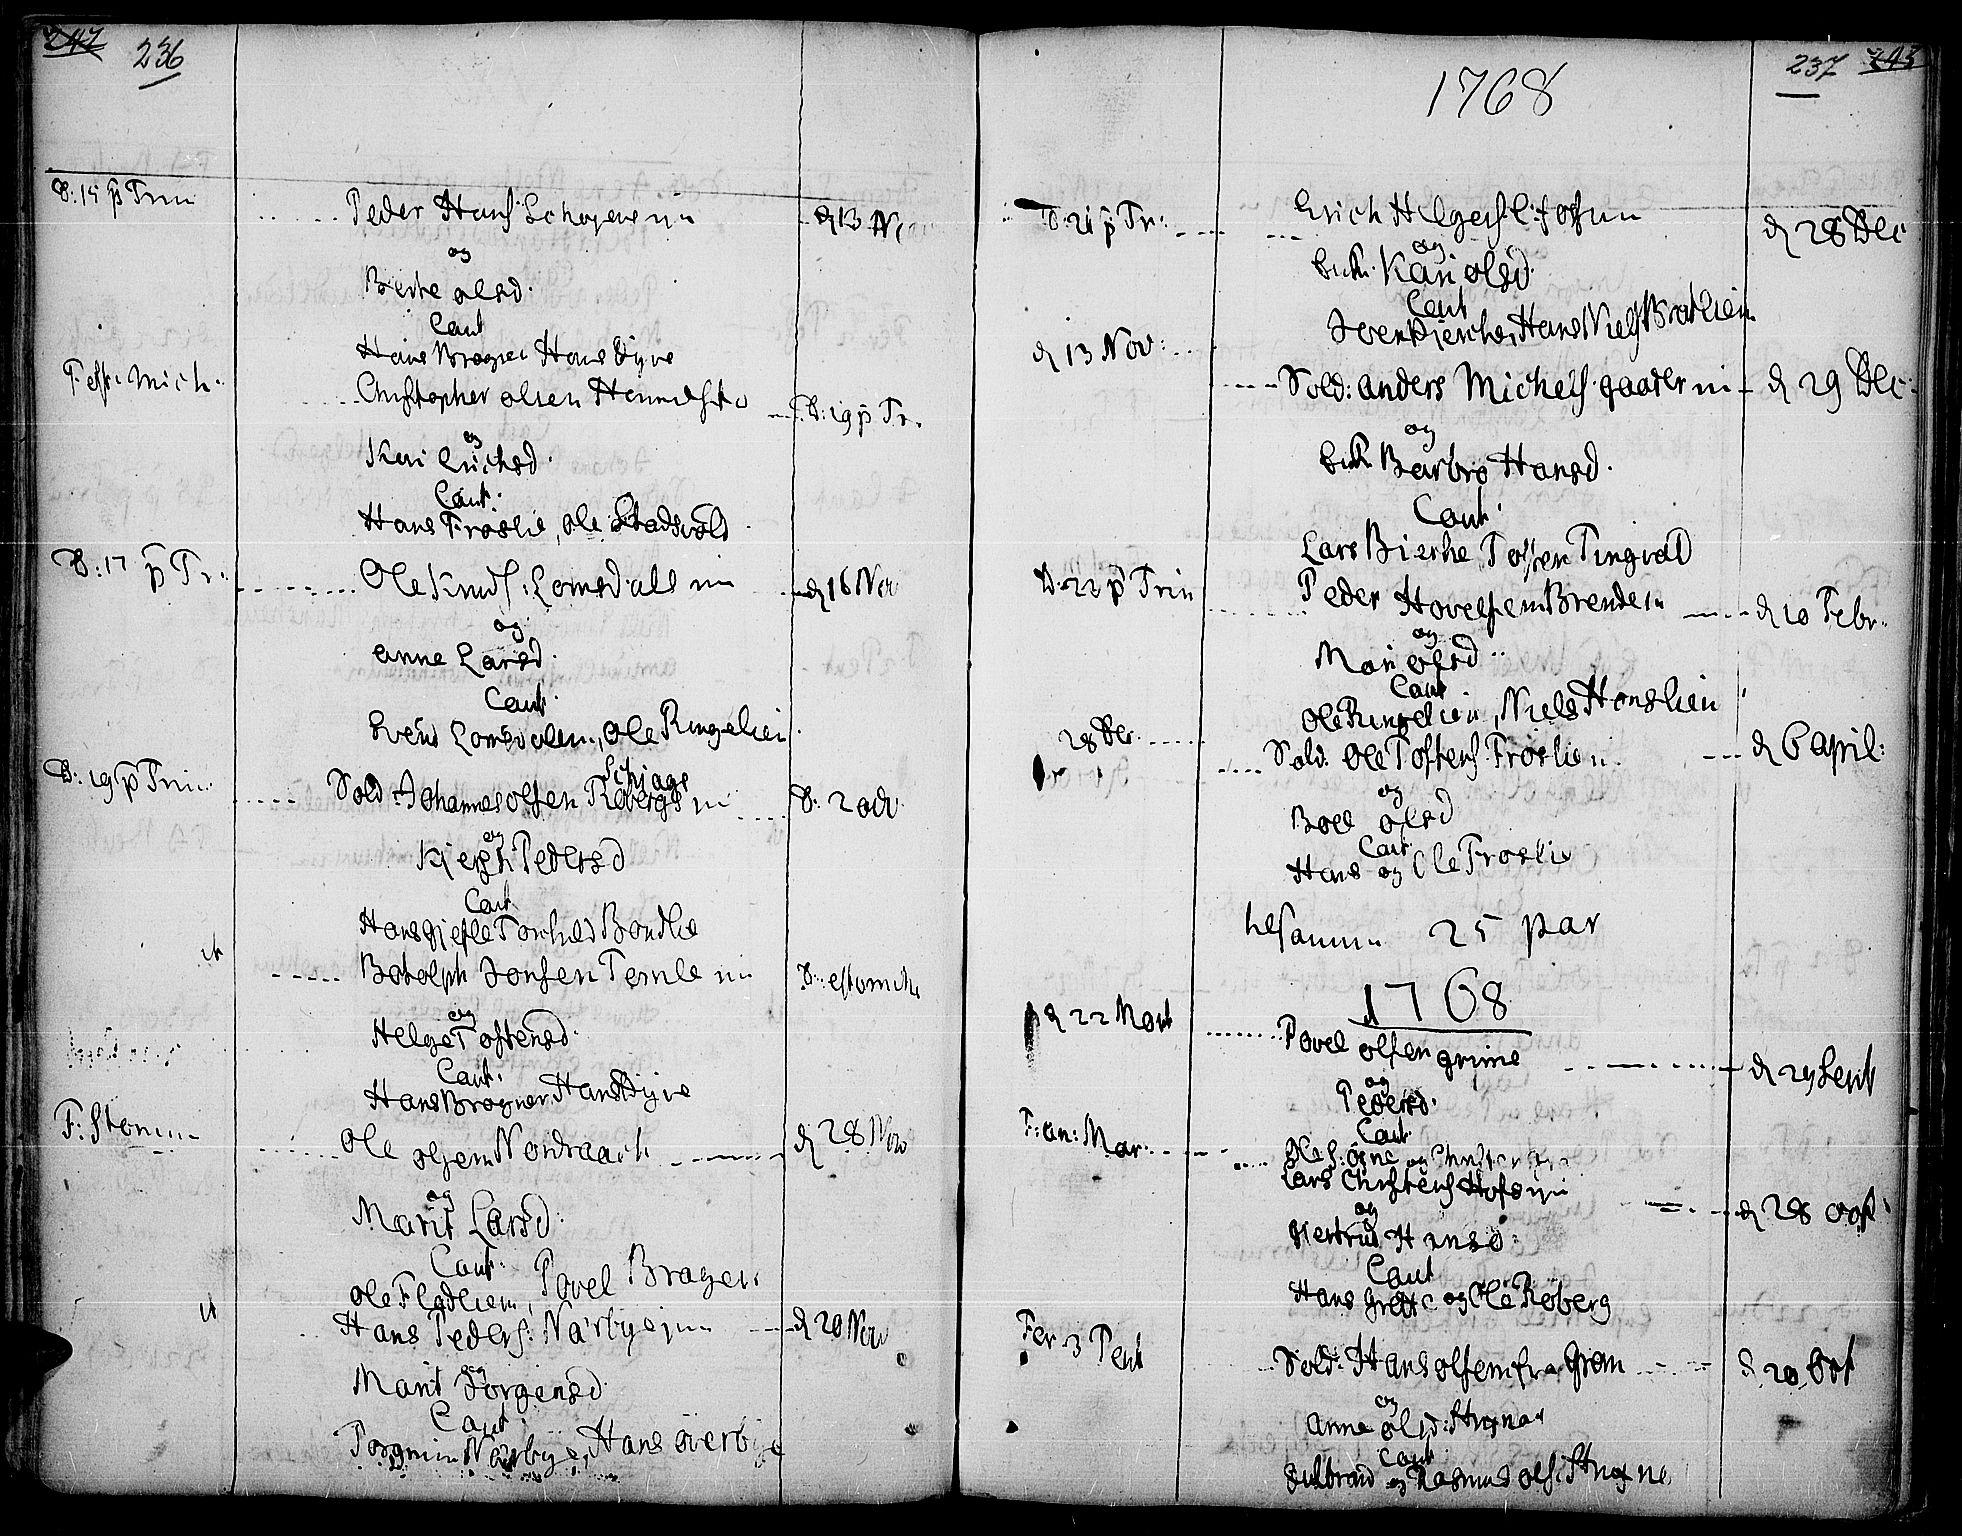 SAH, Land prestekontor, Ministerialbok nr. 5, 1765-1784, s. 236-237